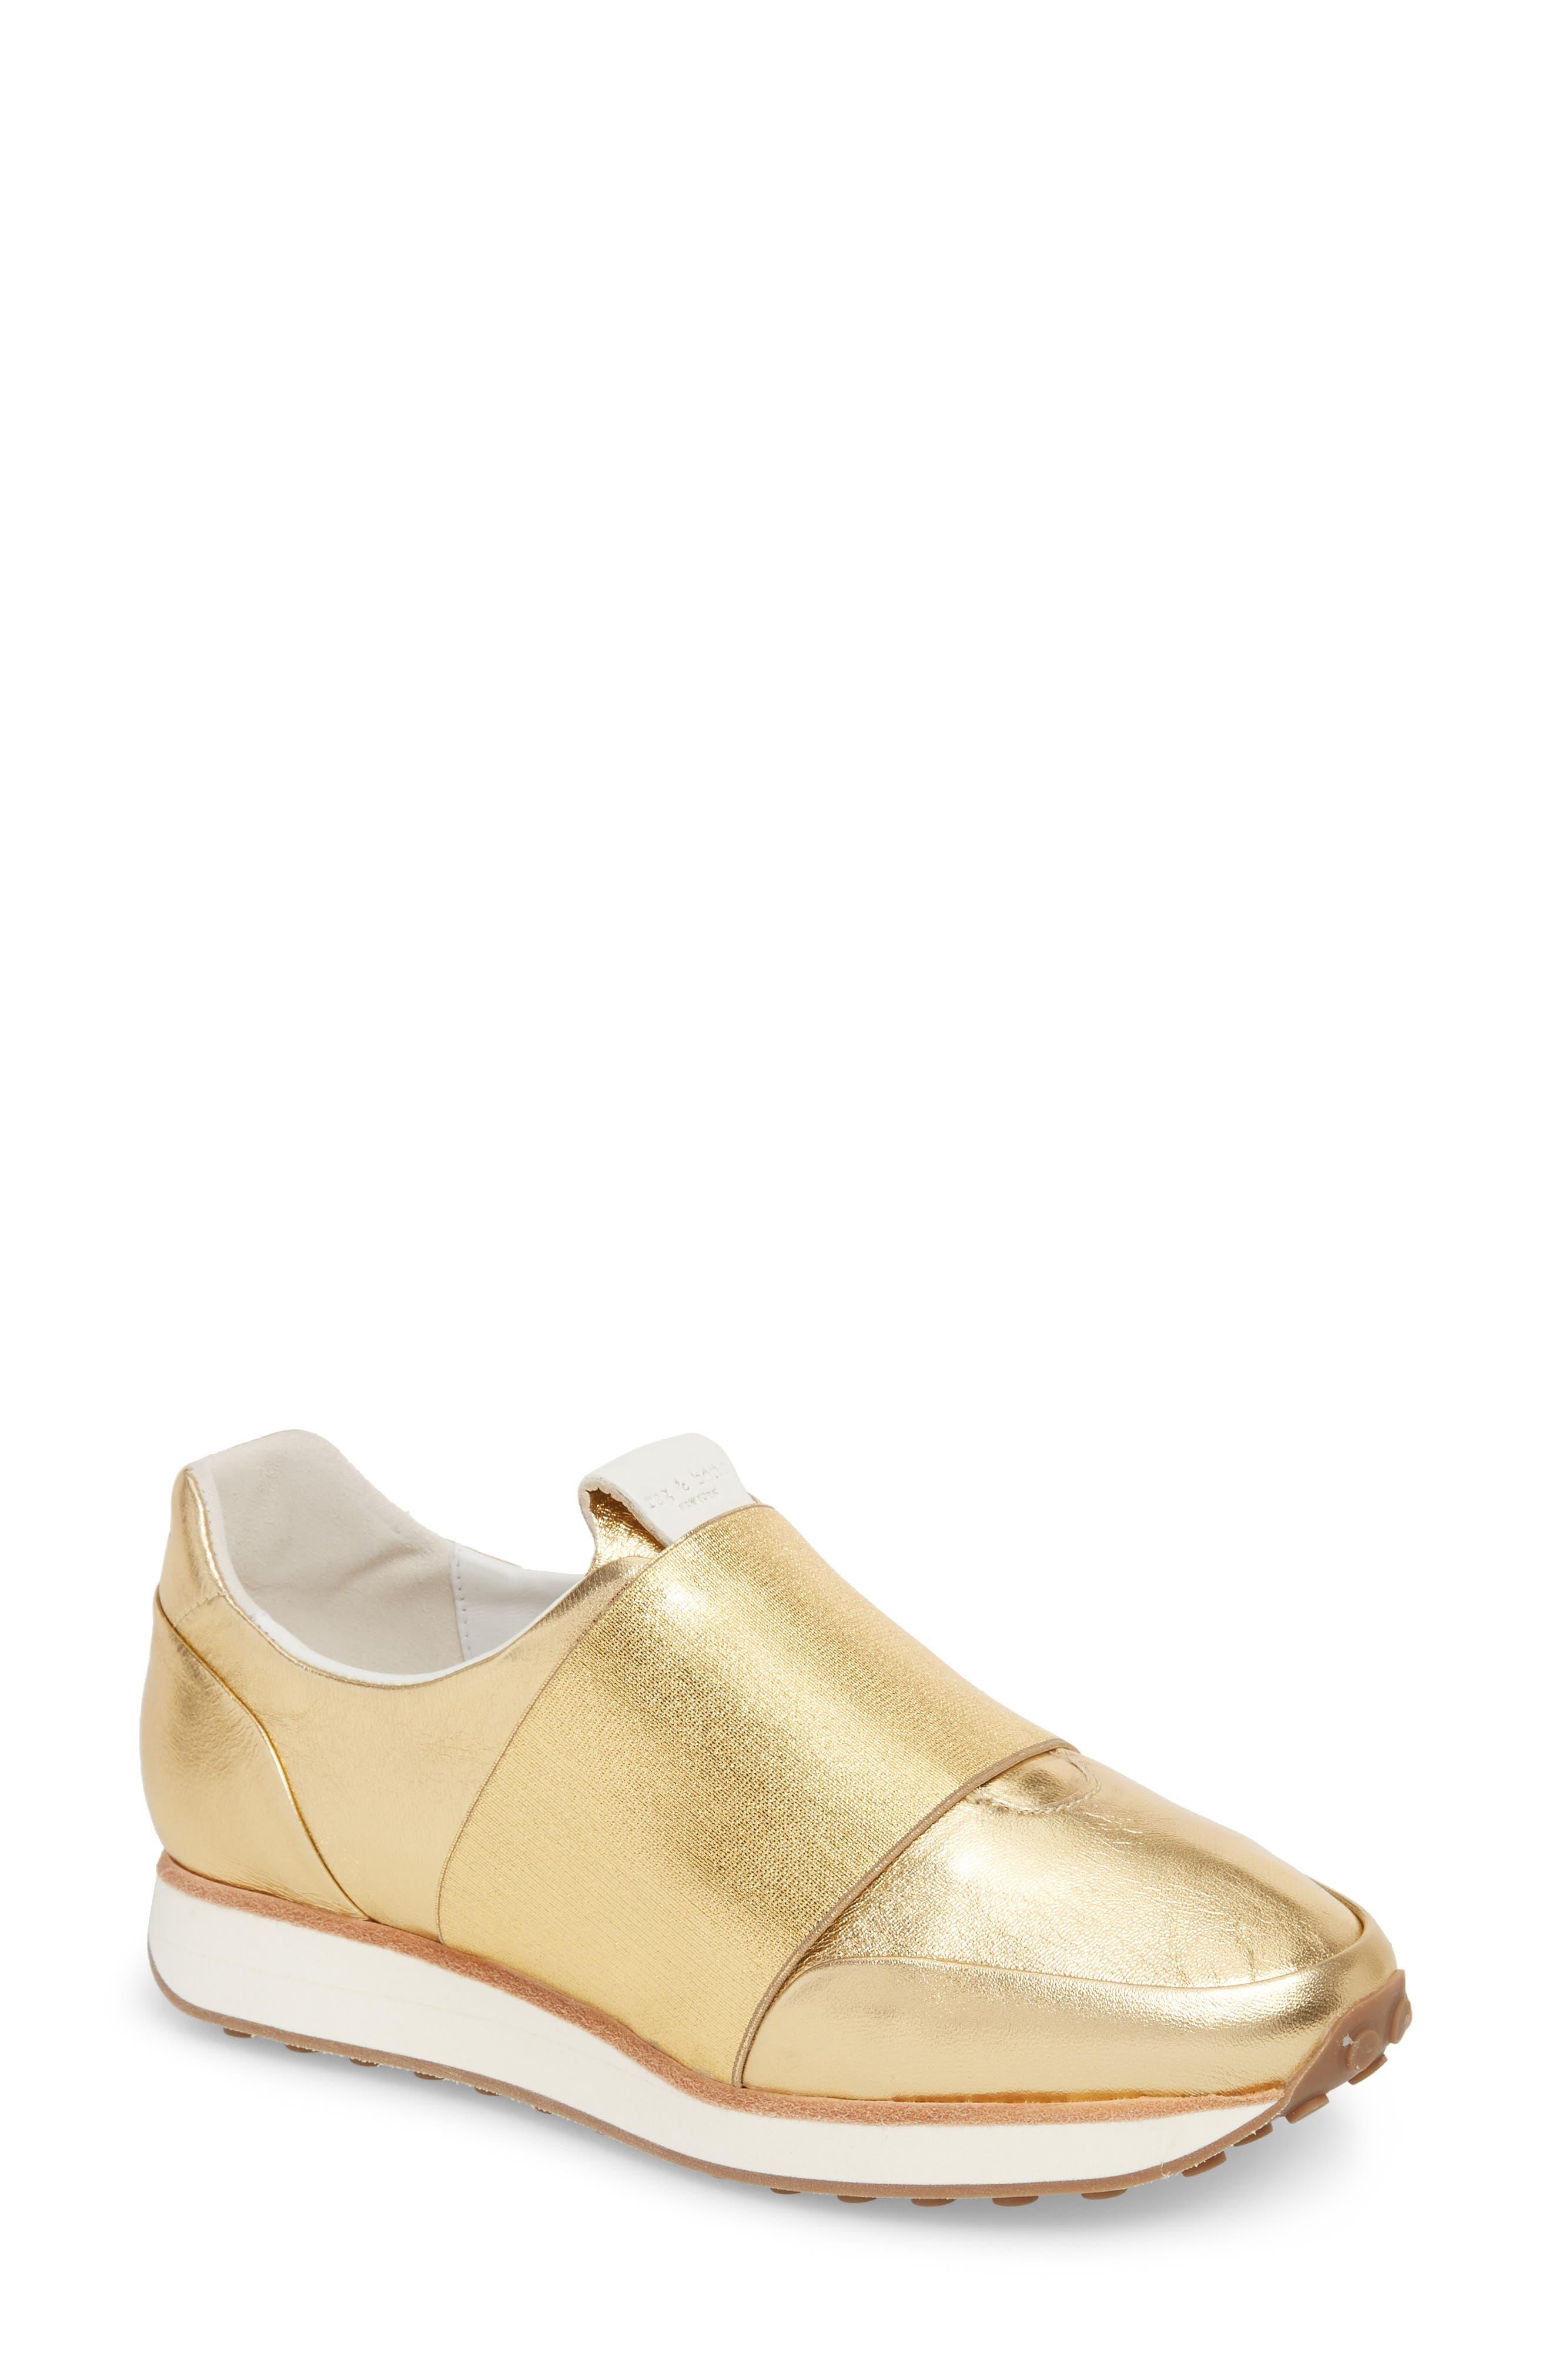 Dylan Sneaker,                         Main,                         color, Gold